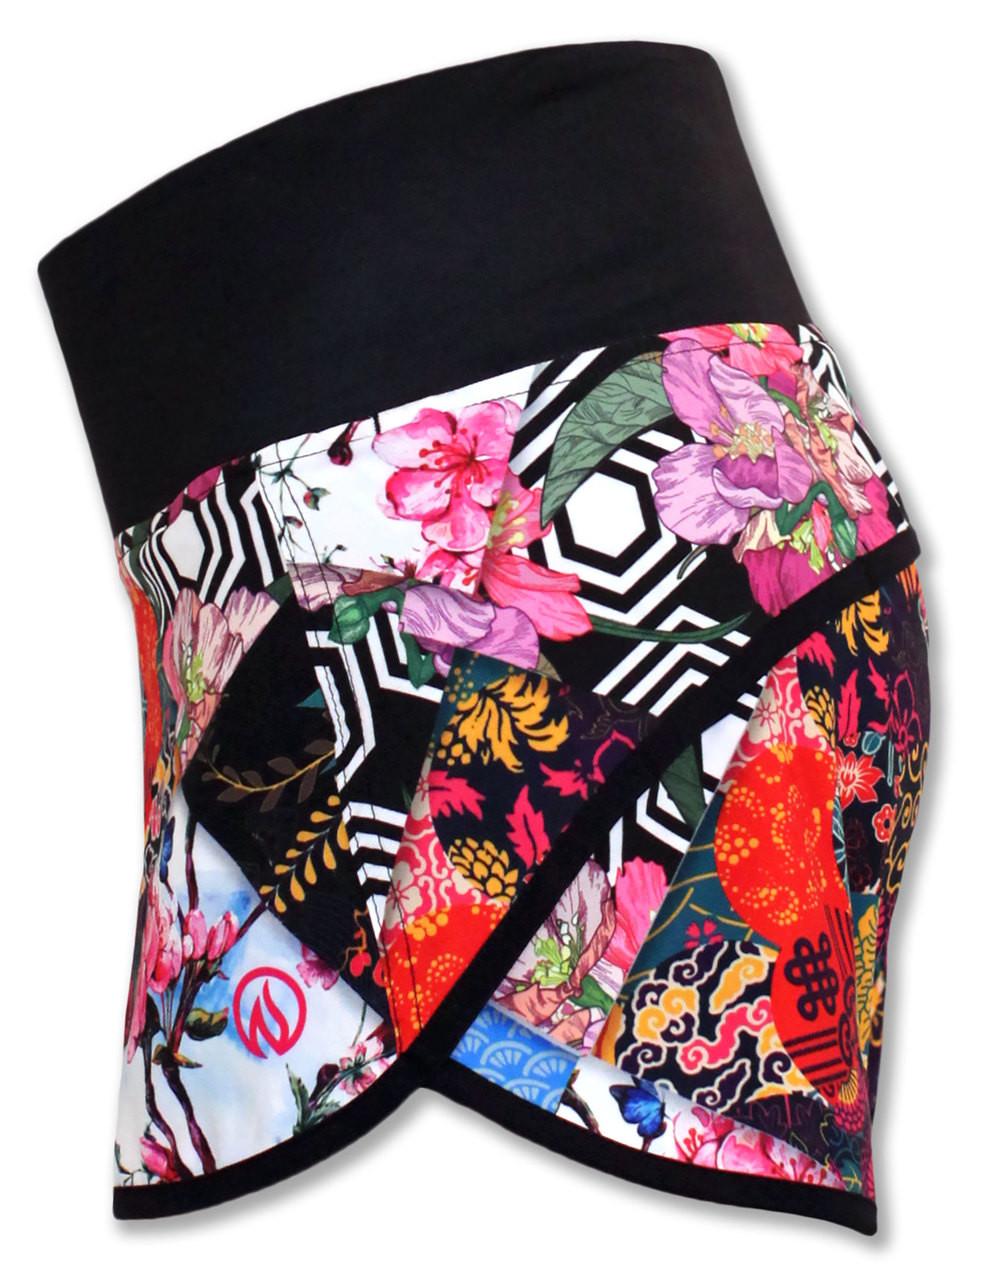 INKnBURN Women's Origami Shorts side